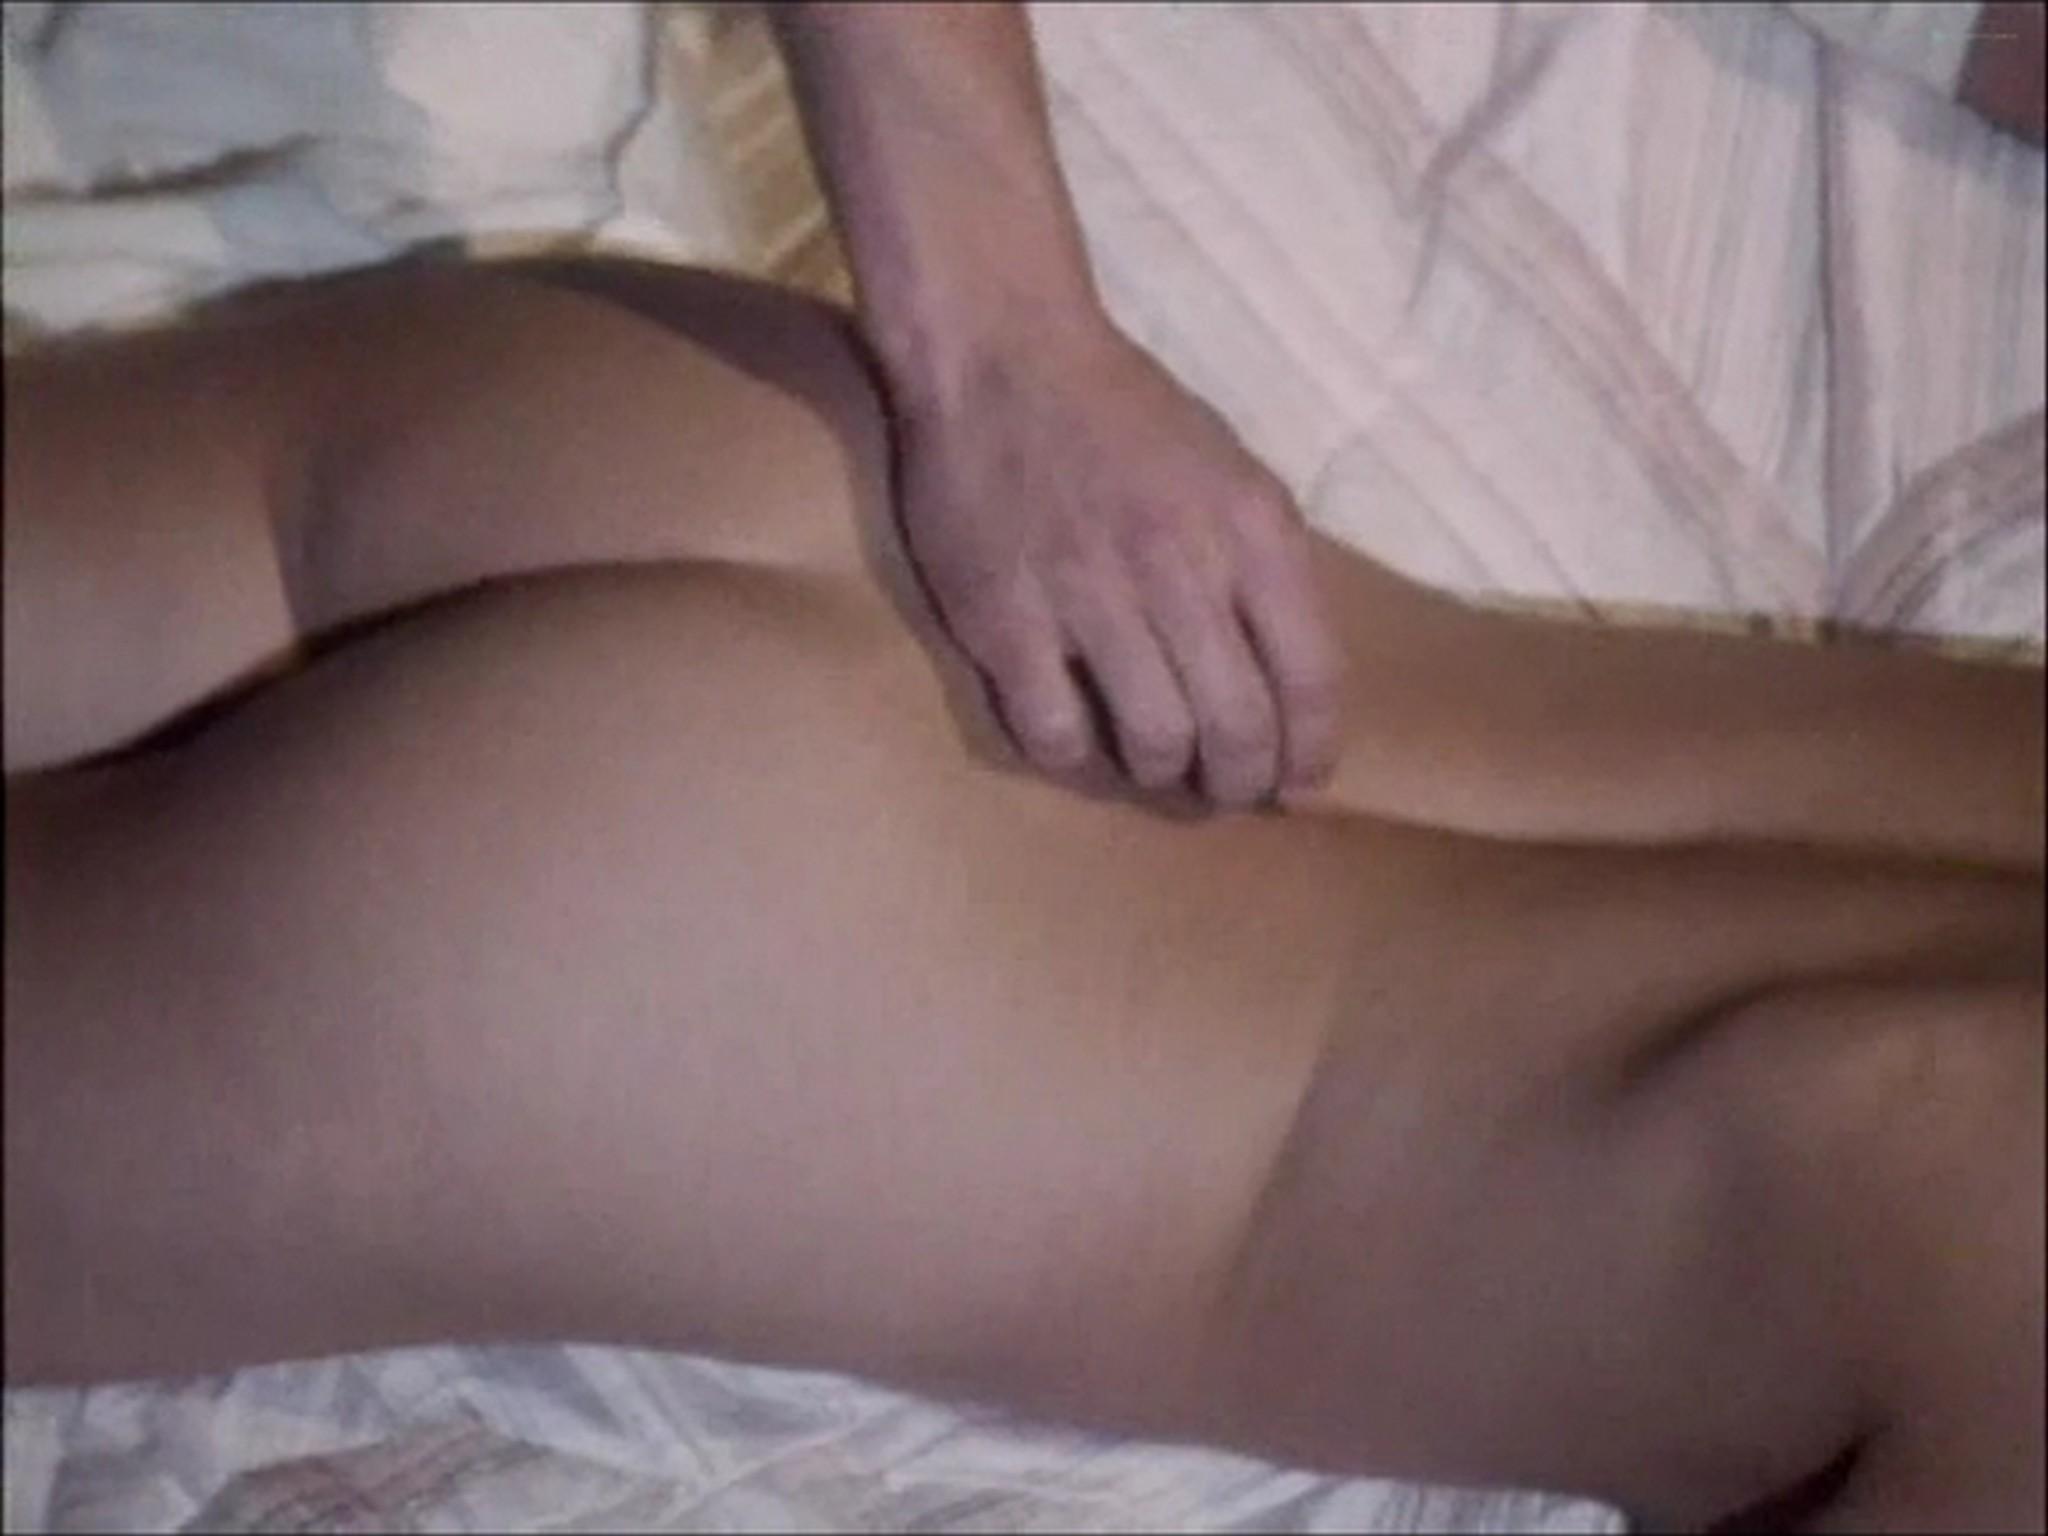 Malu nude full frontal and sex Lidija Zovkic Games of Desire IT 1991 VHSrip 012